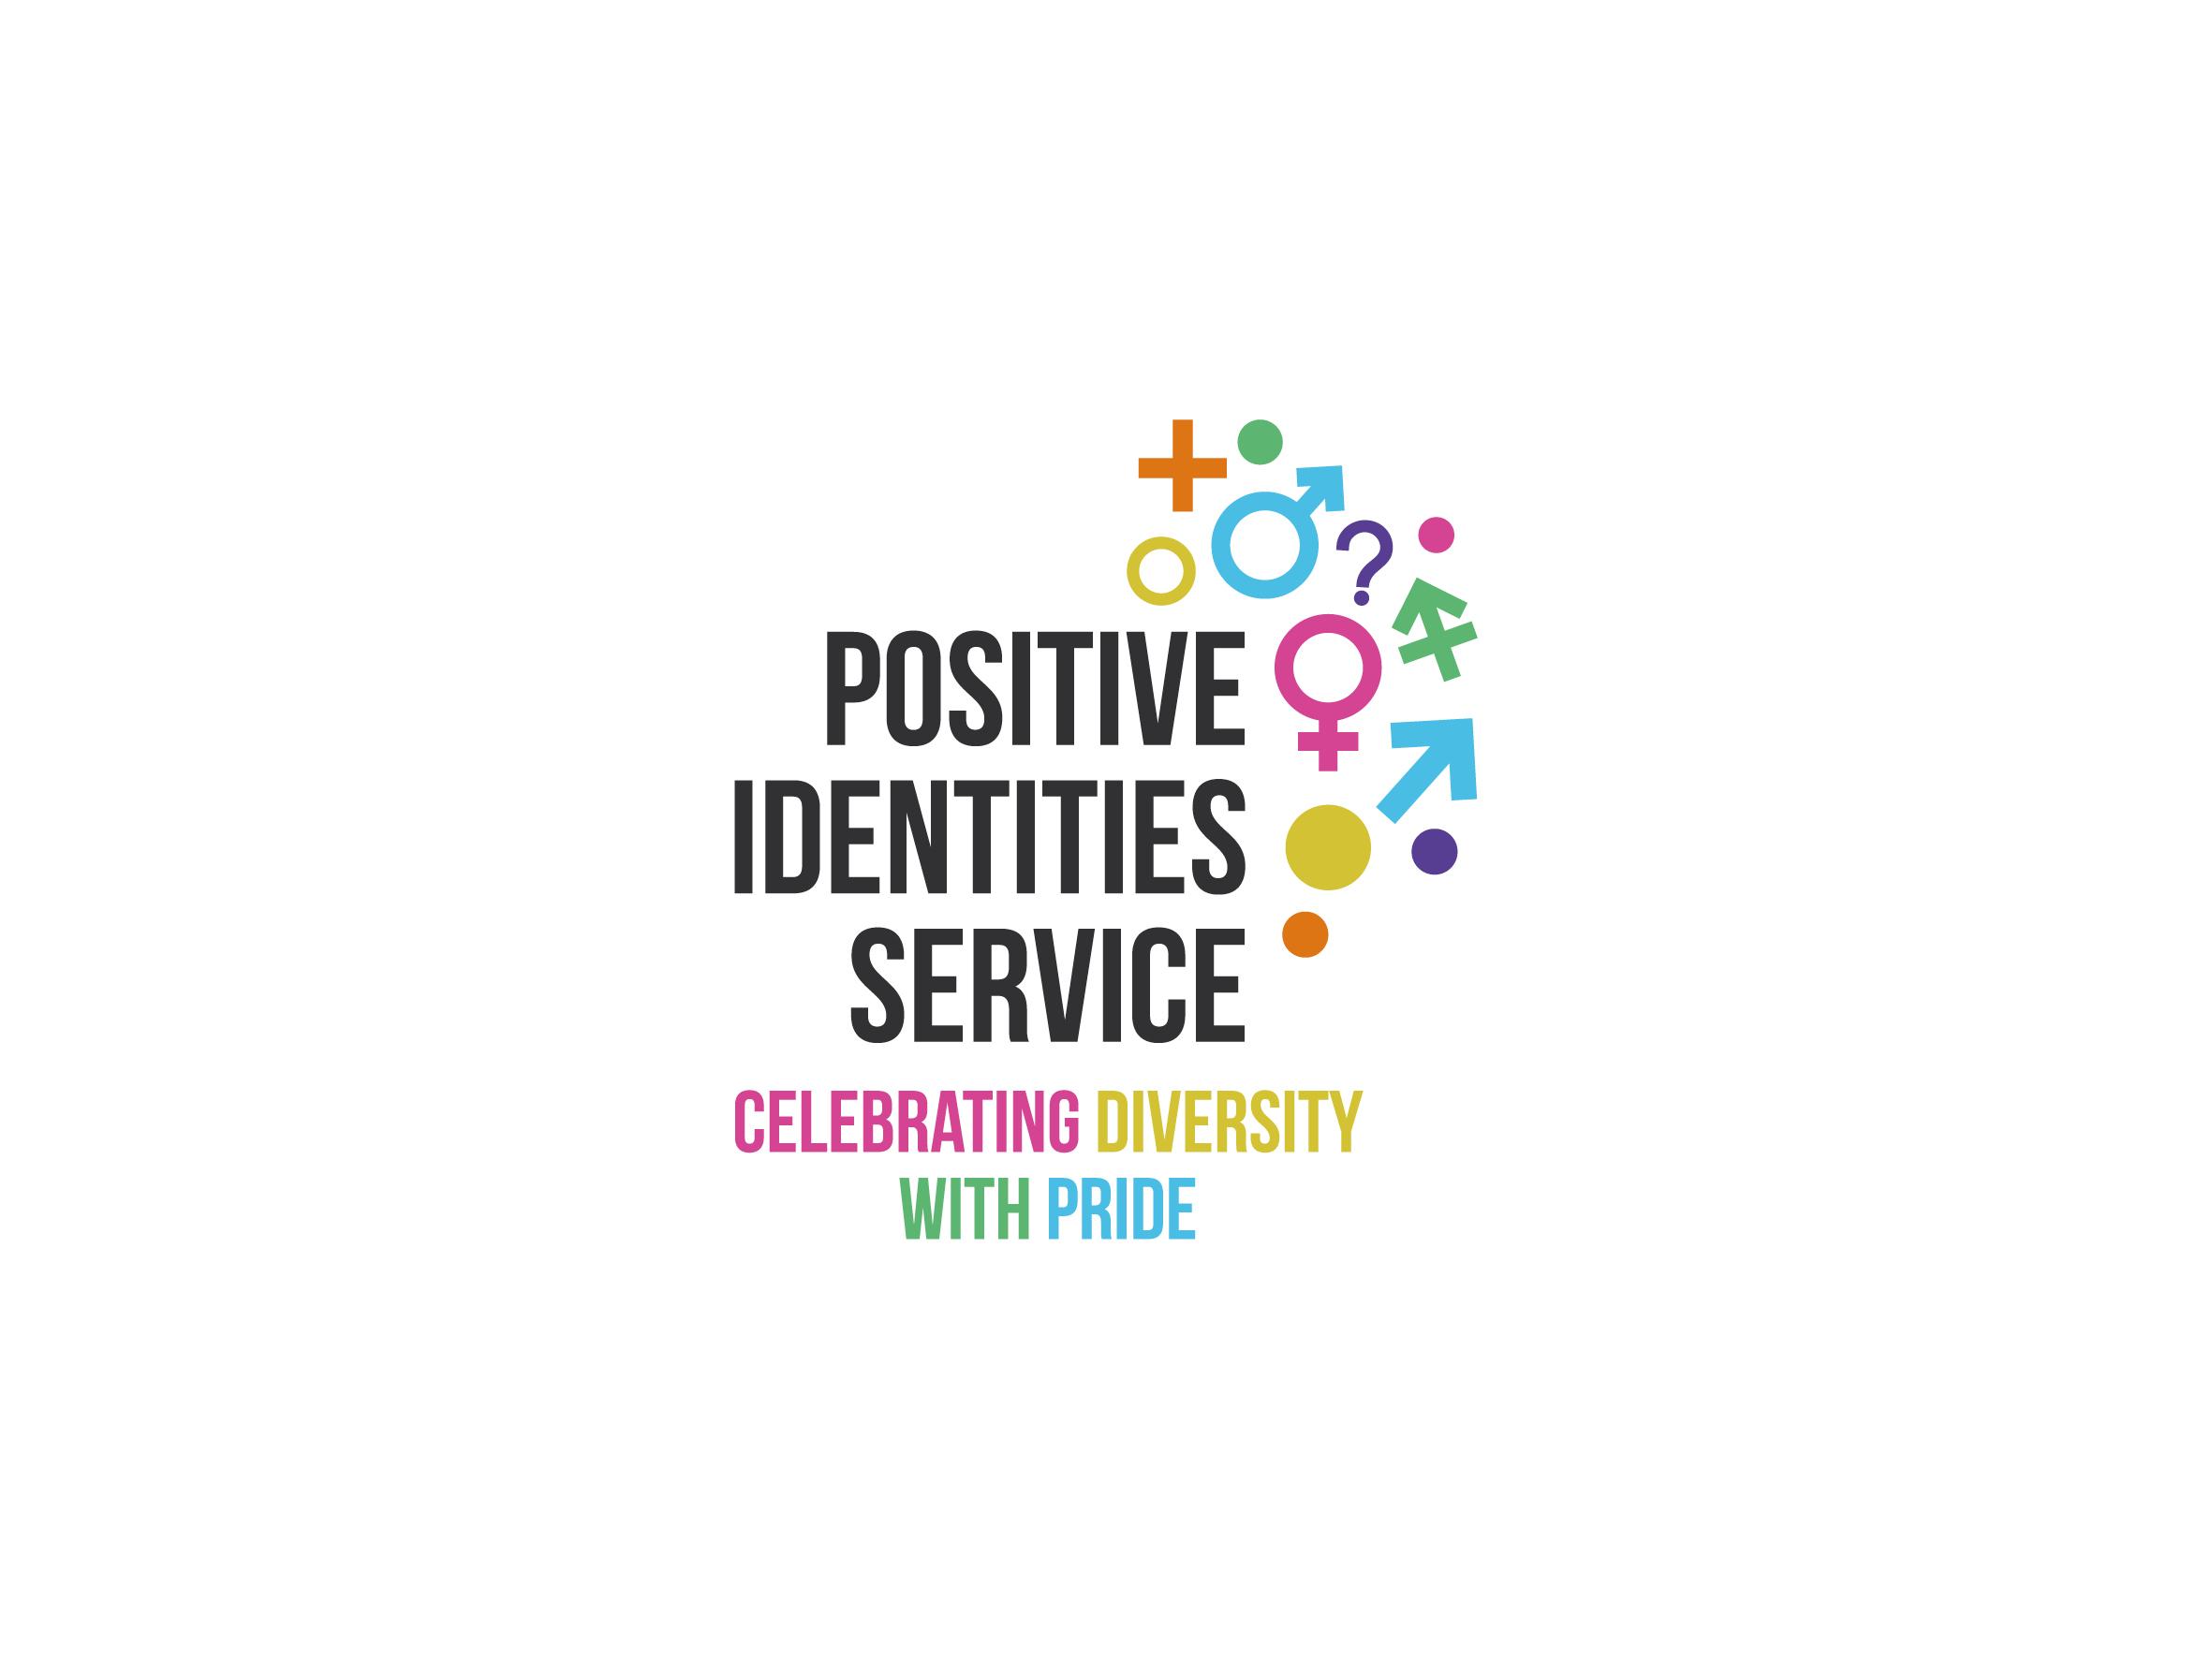 positive identities service barnardo's logo design designed by Dakini Design Saltaire, Shipley, Bradford